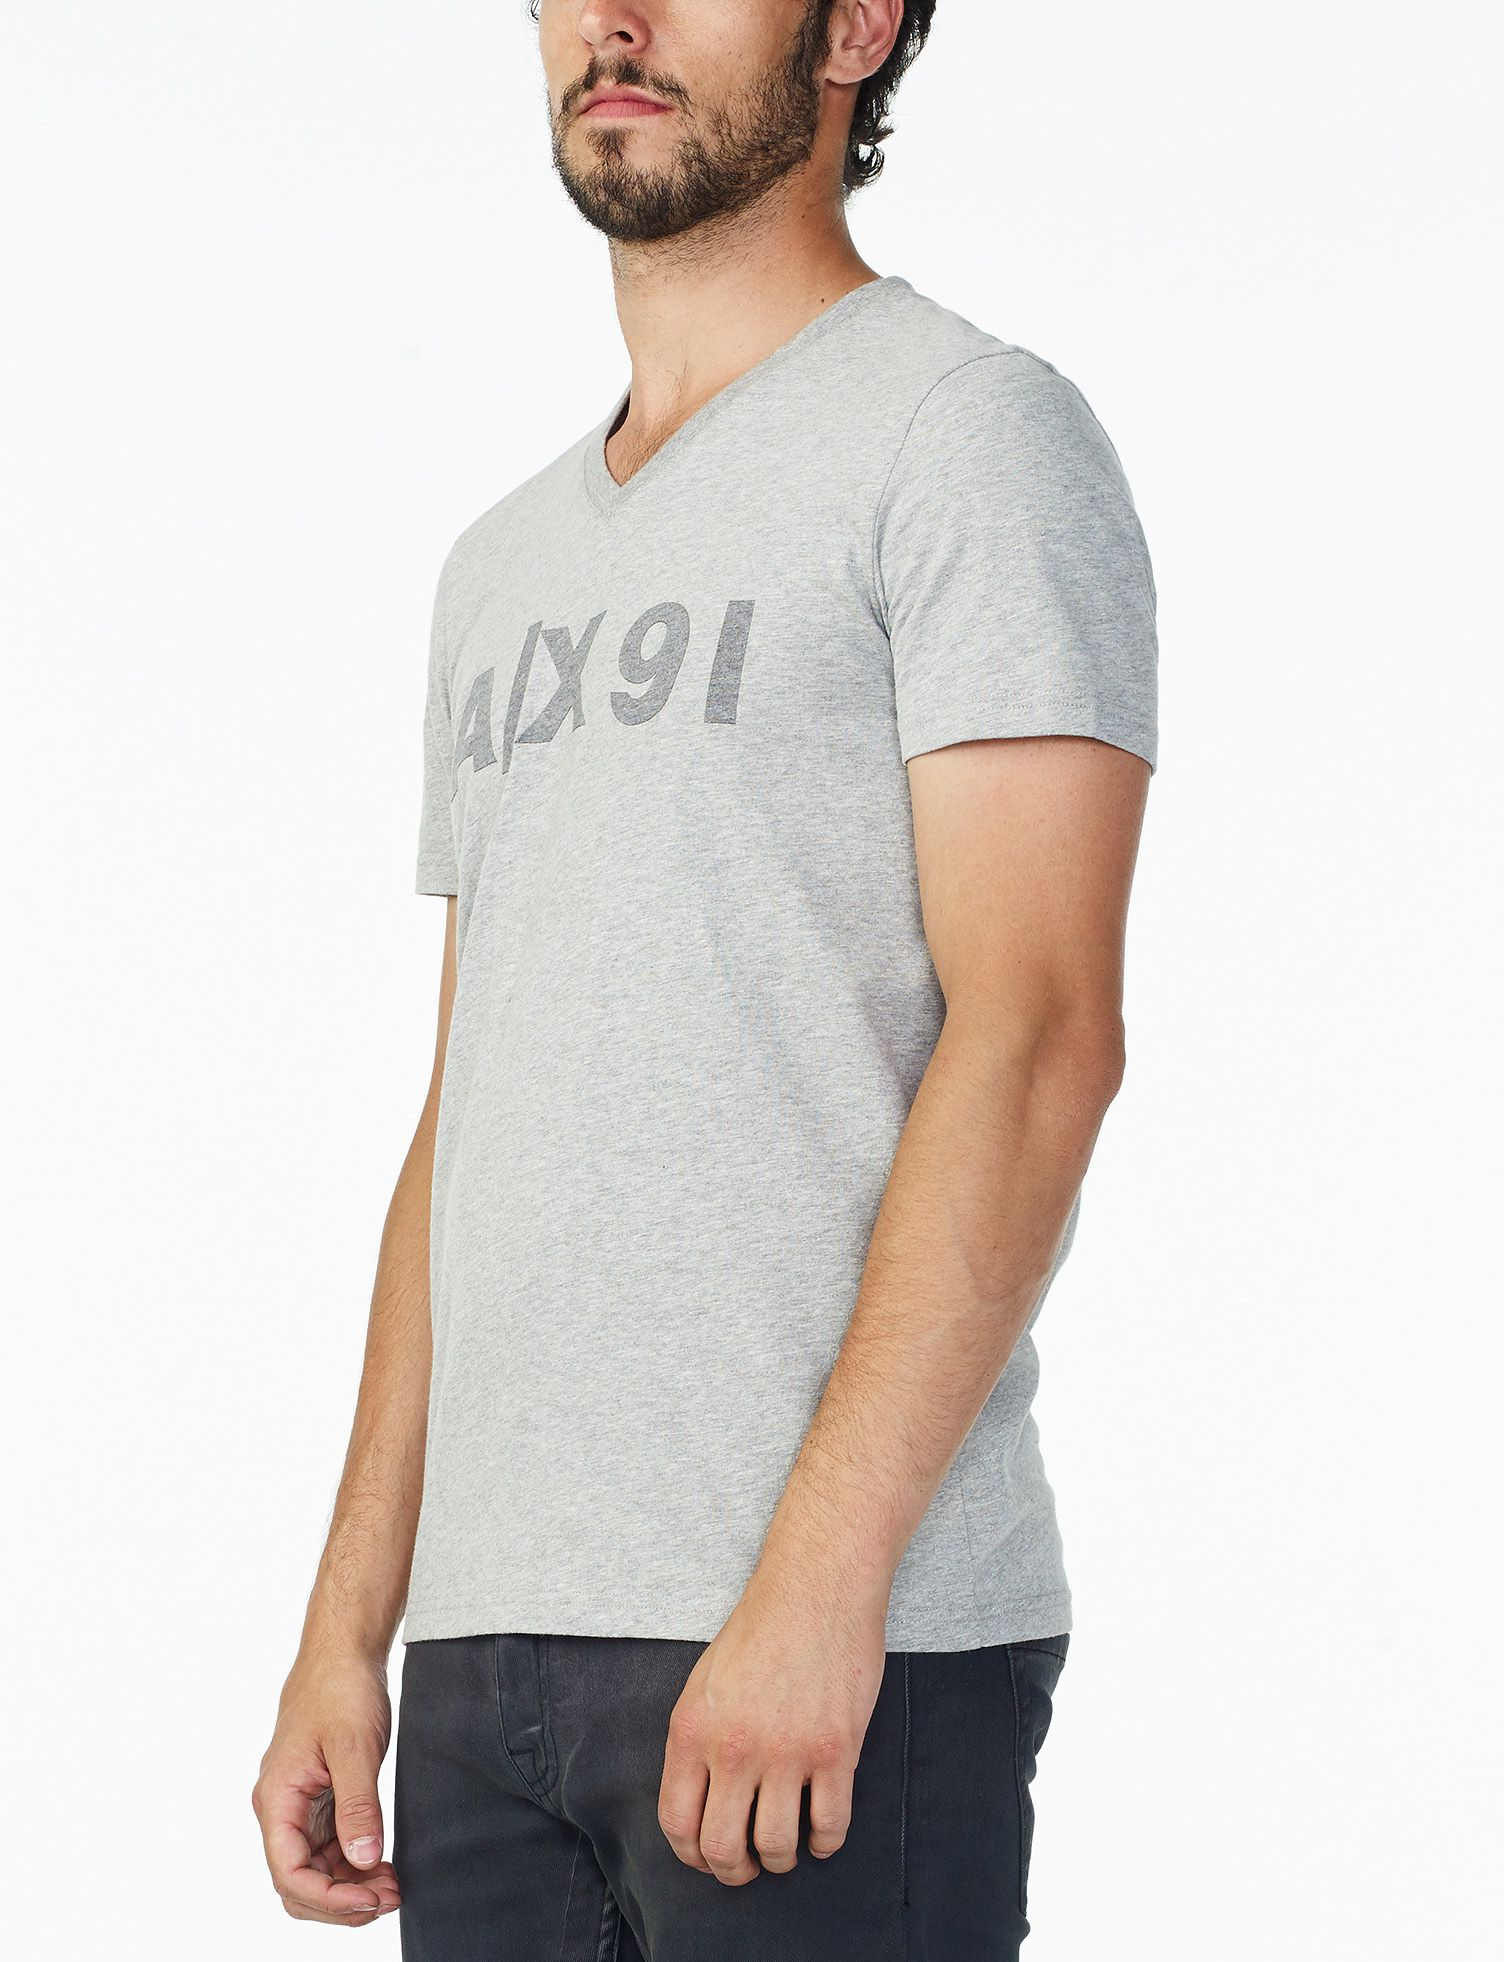 Camiseta Armani Exchange AX91 - EuEnvio Importados  Relógios 95d929d9c9fb8